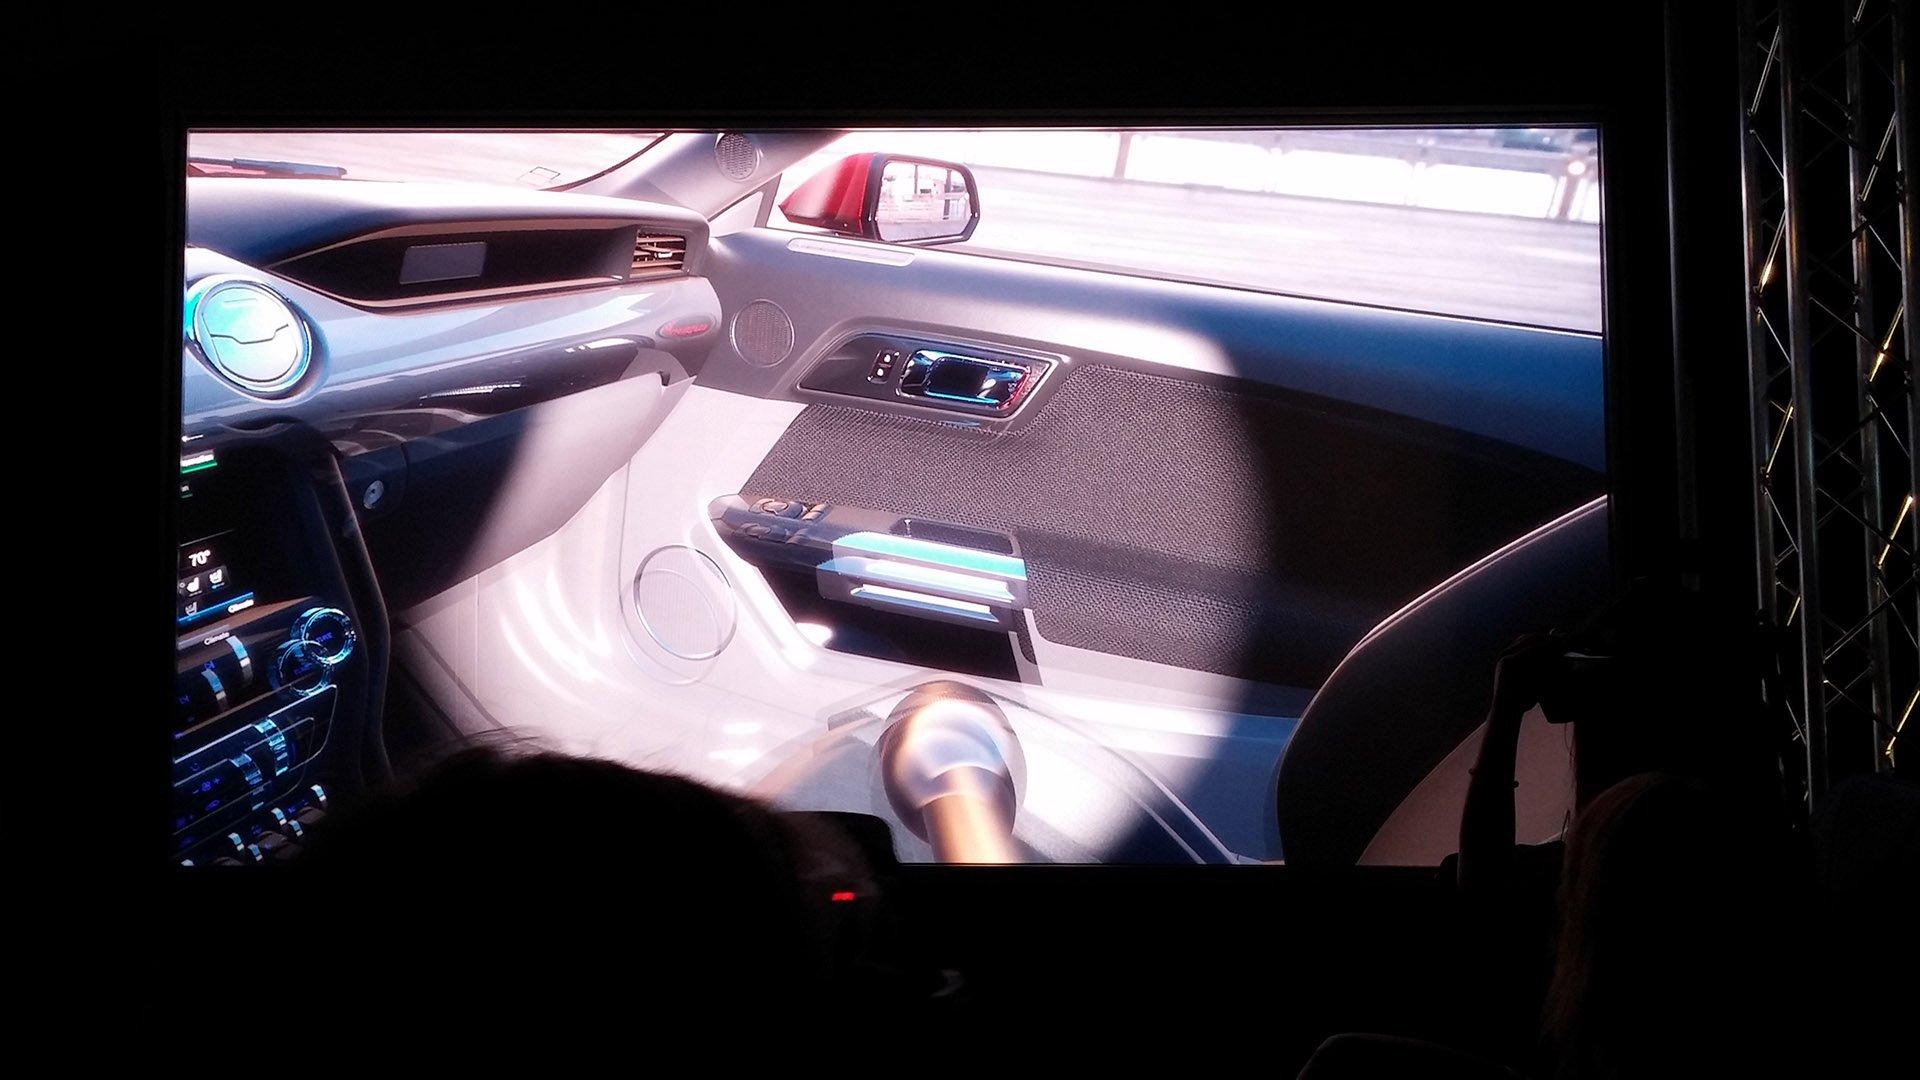 IGI custom fabrication powerwindow automotive interior